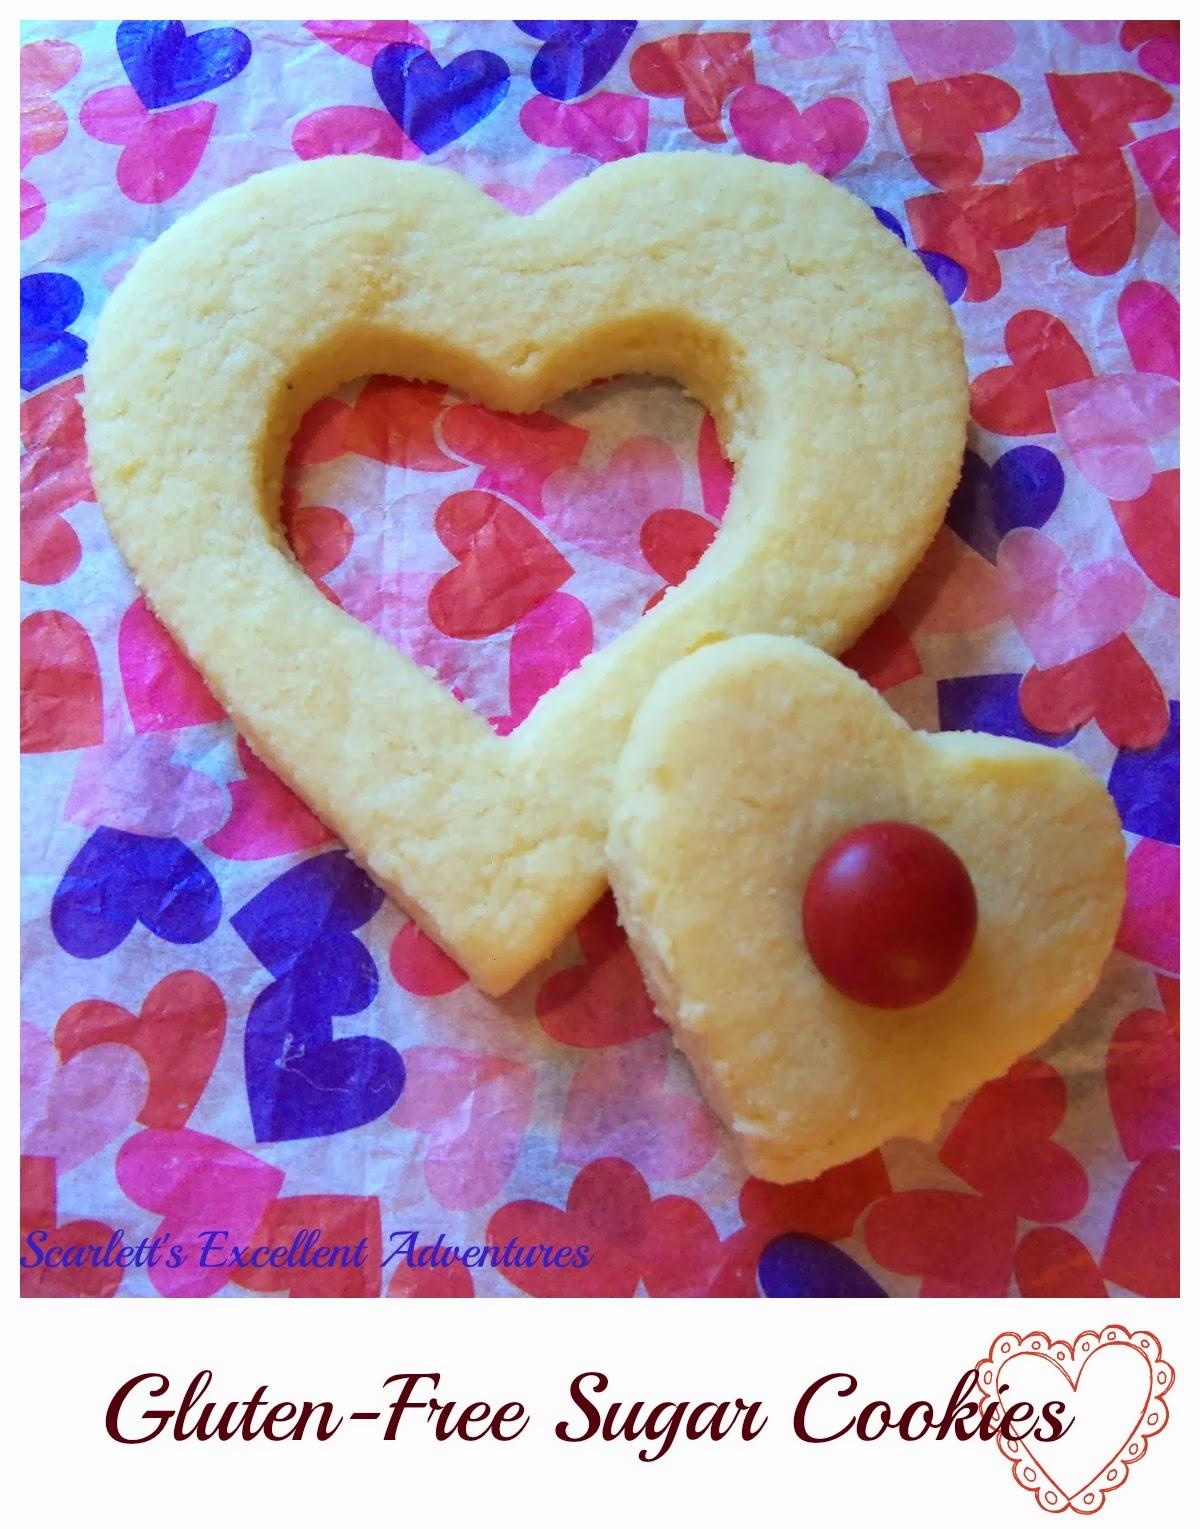 Gluten-Free Sugar Cookies Recipe